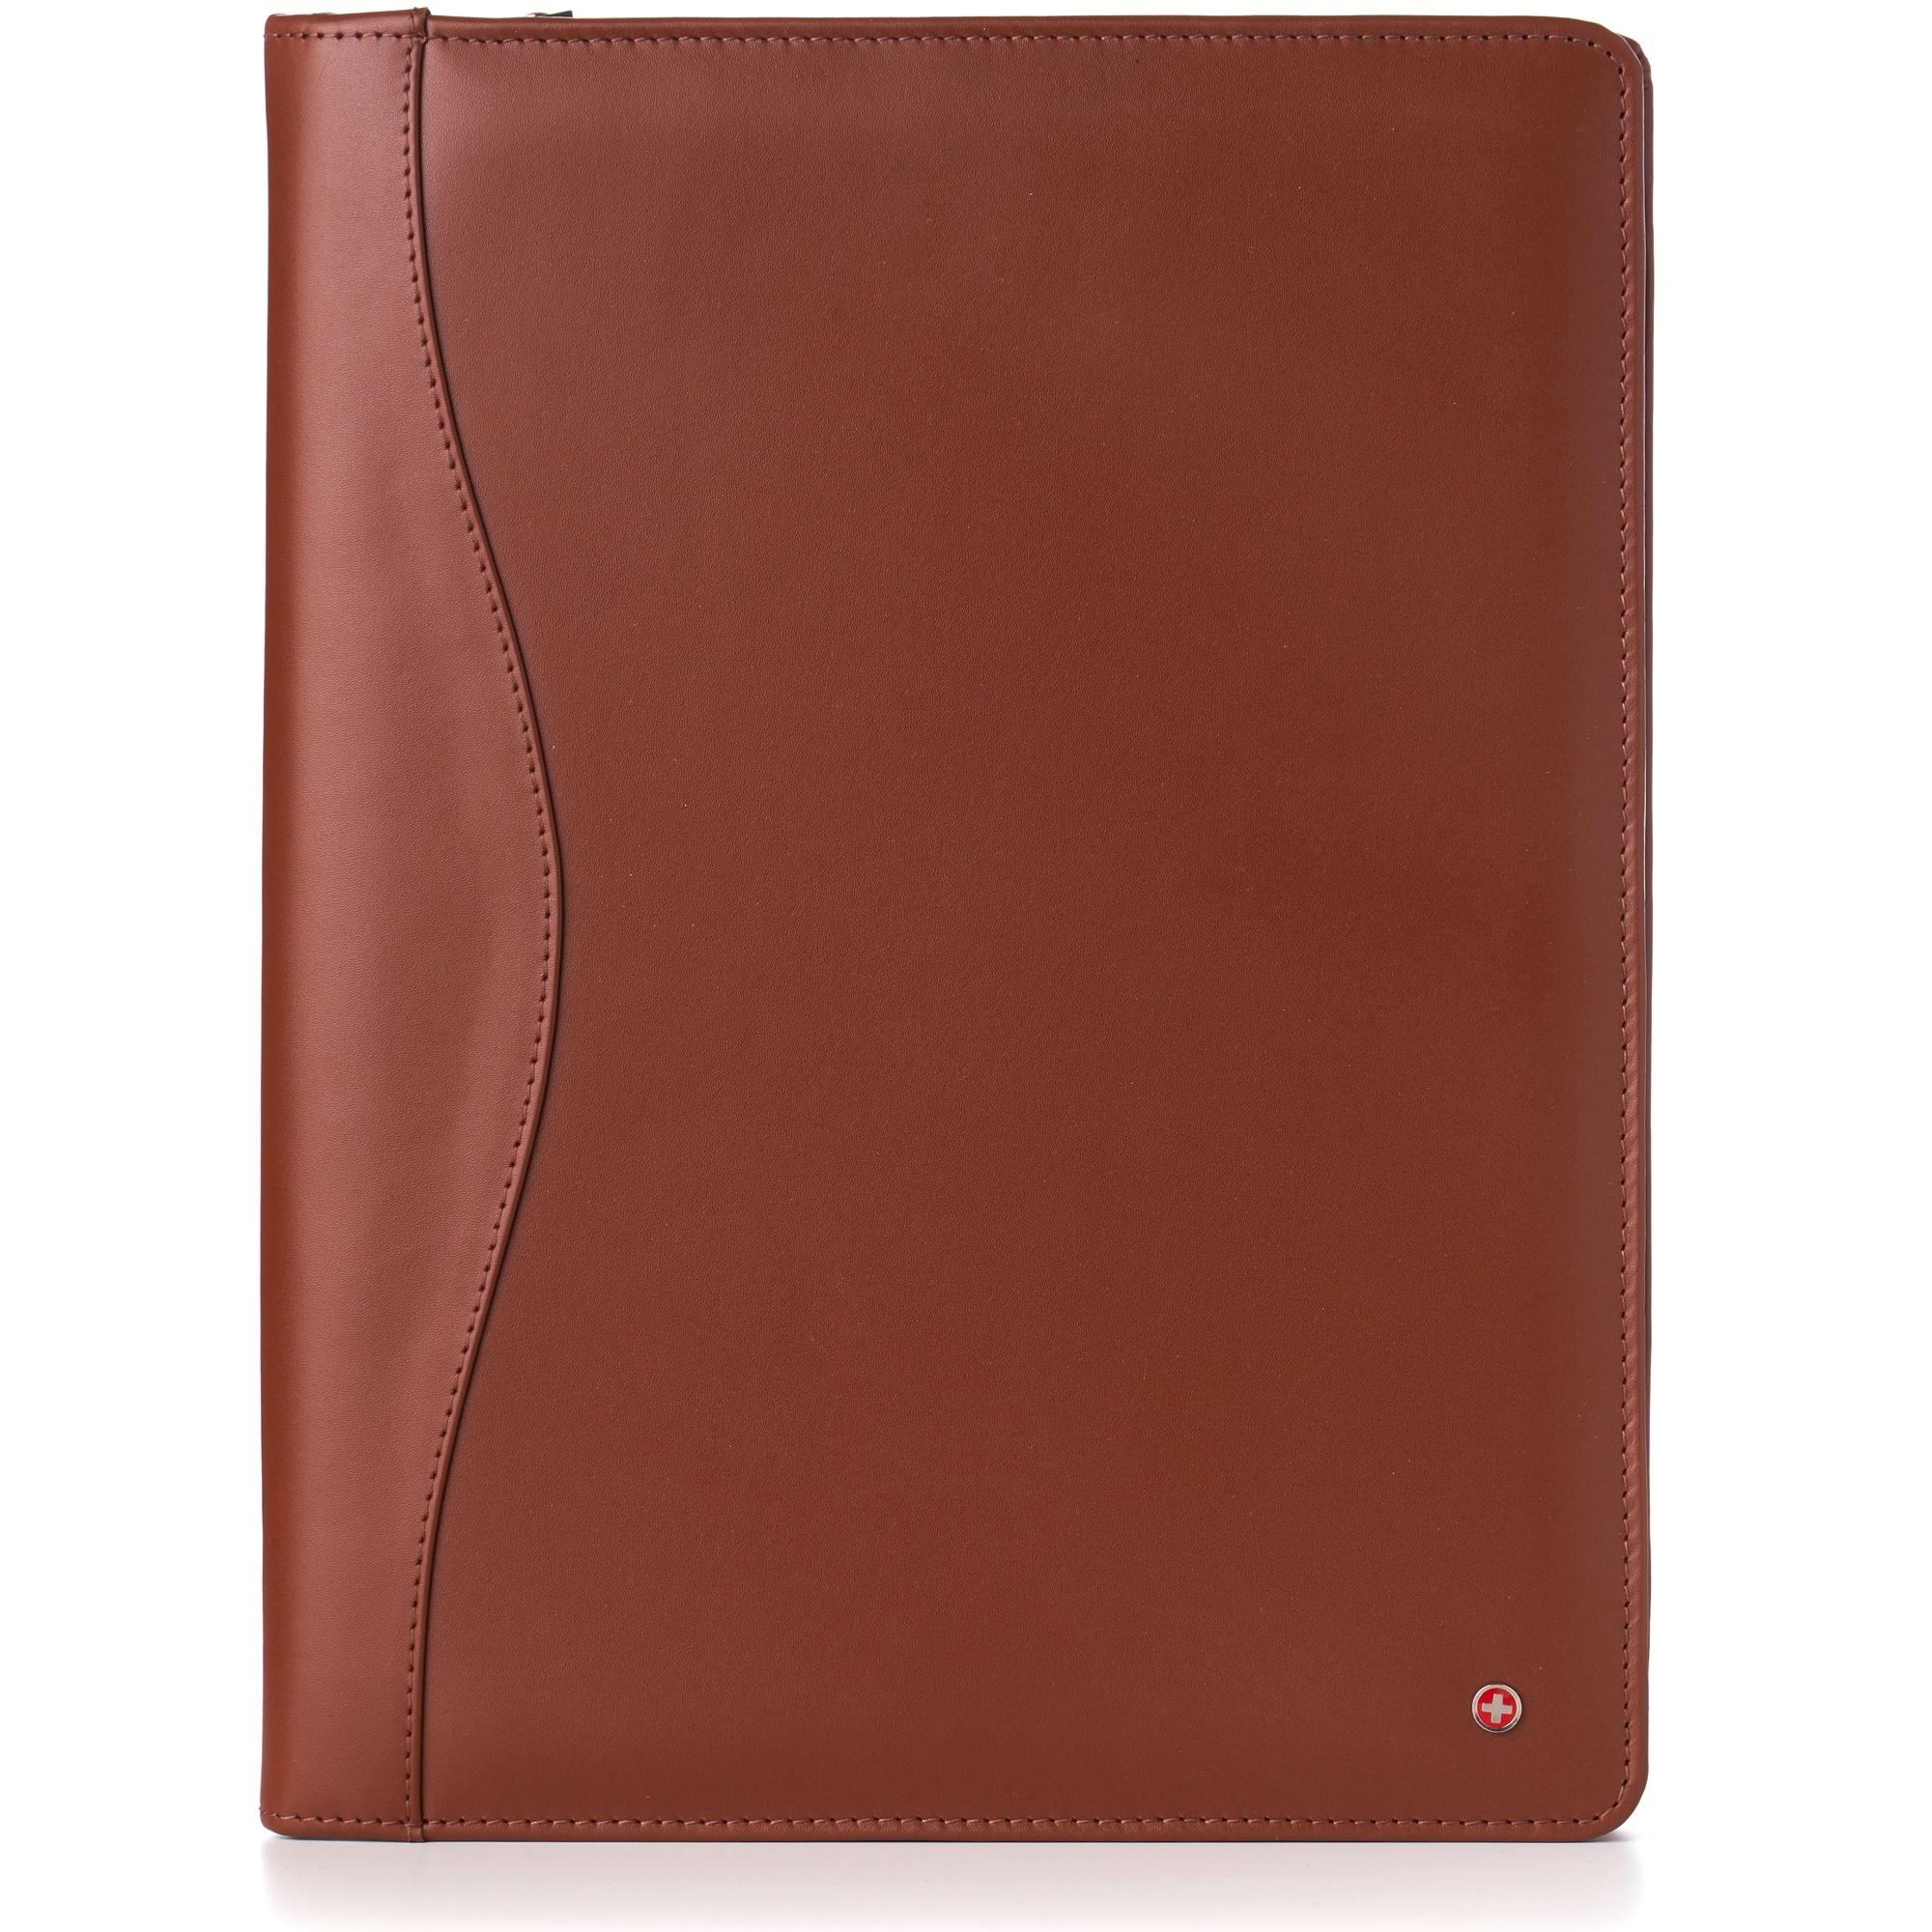 thumbnail 48 - Alpine Swiss Leather Zippered Writing Pad Portfolio Business Briefcase Organizer